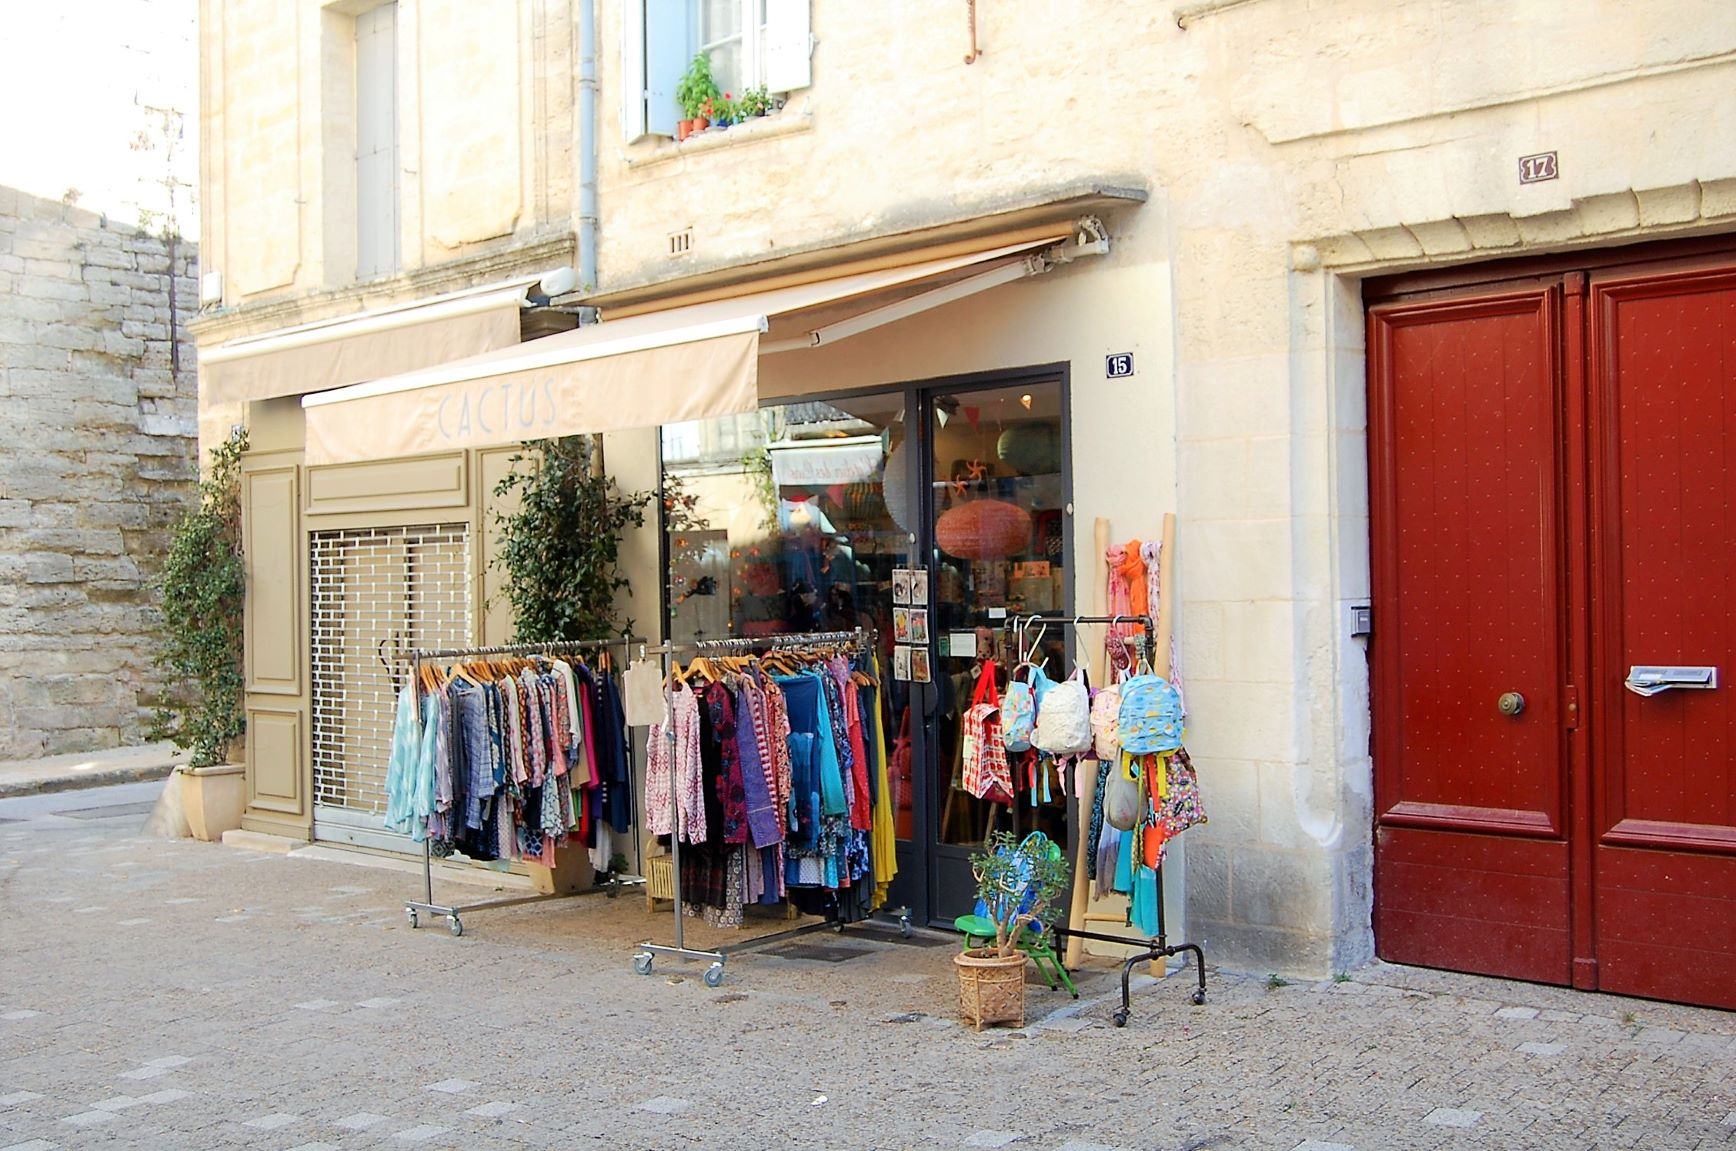 Sommer am Pont-du-Gard – Kapitel 8